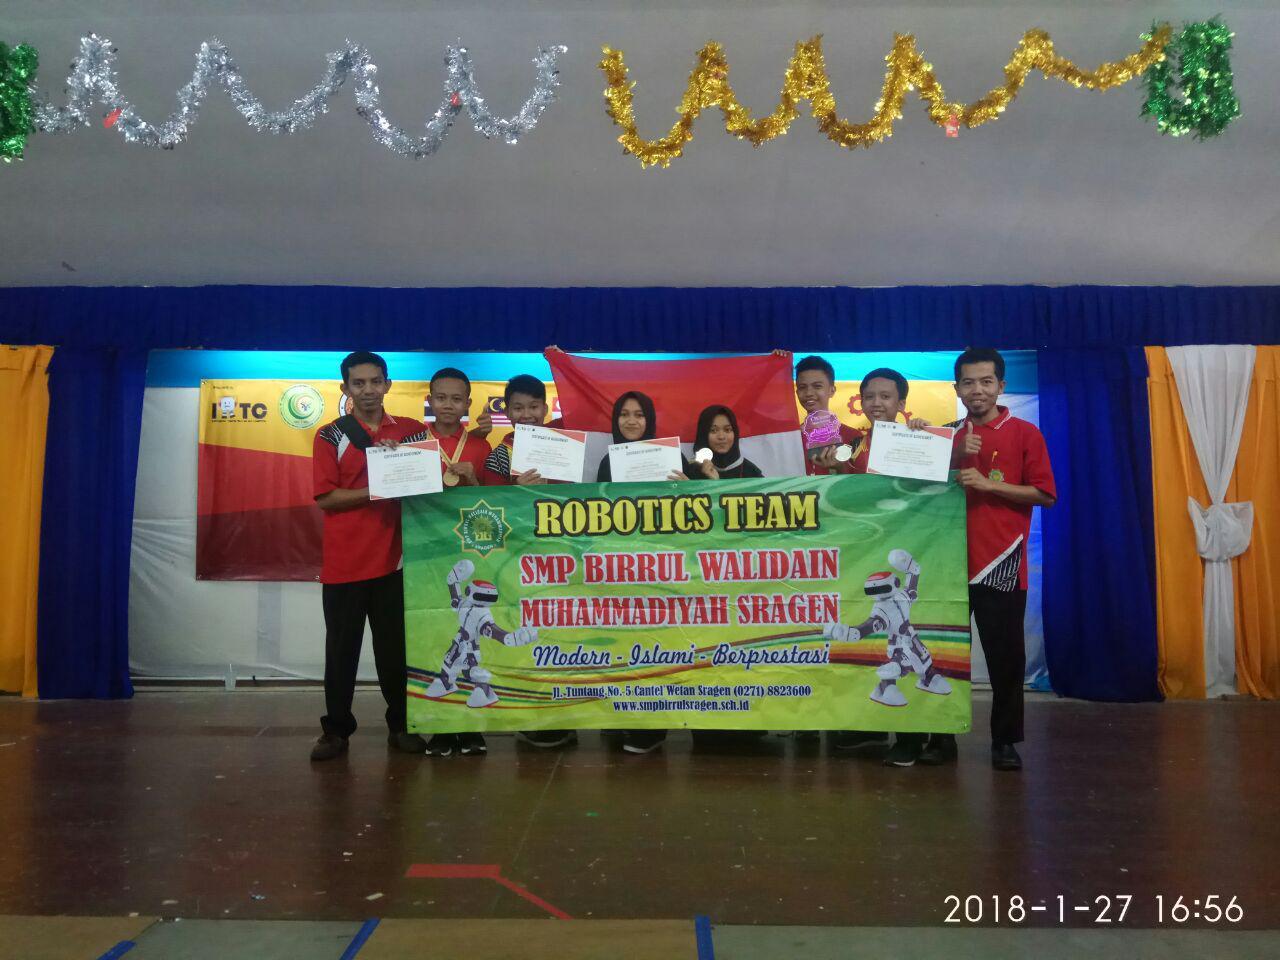 Juara Robotika Tingkat Internasional di Thailand